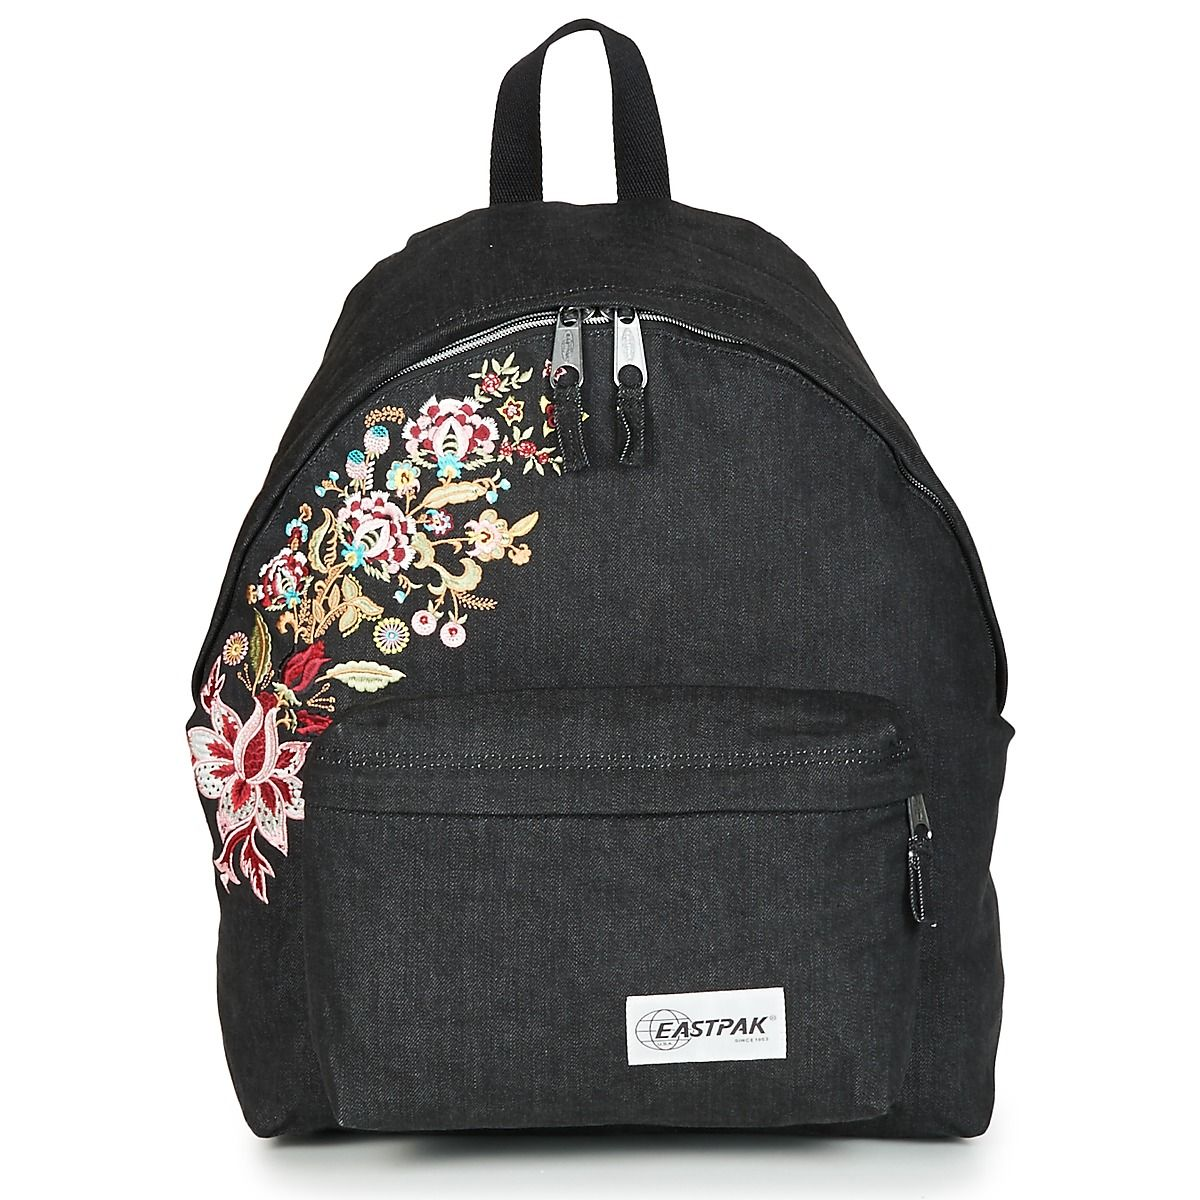 amazon sac eastpak blanc à fleurs